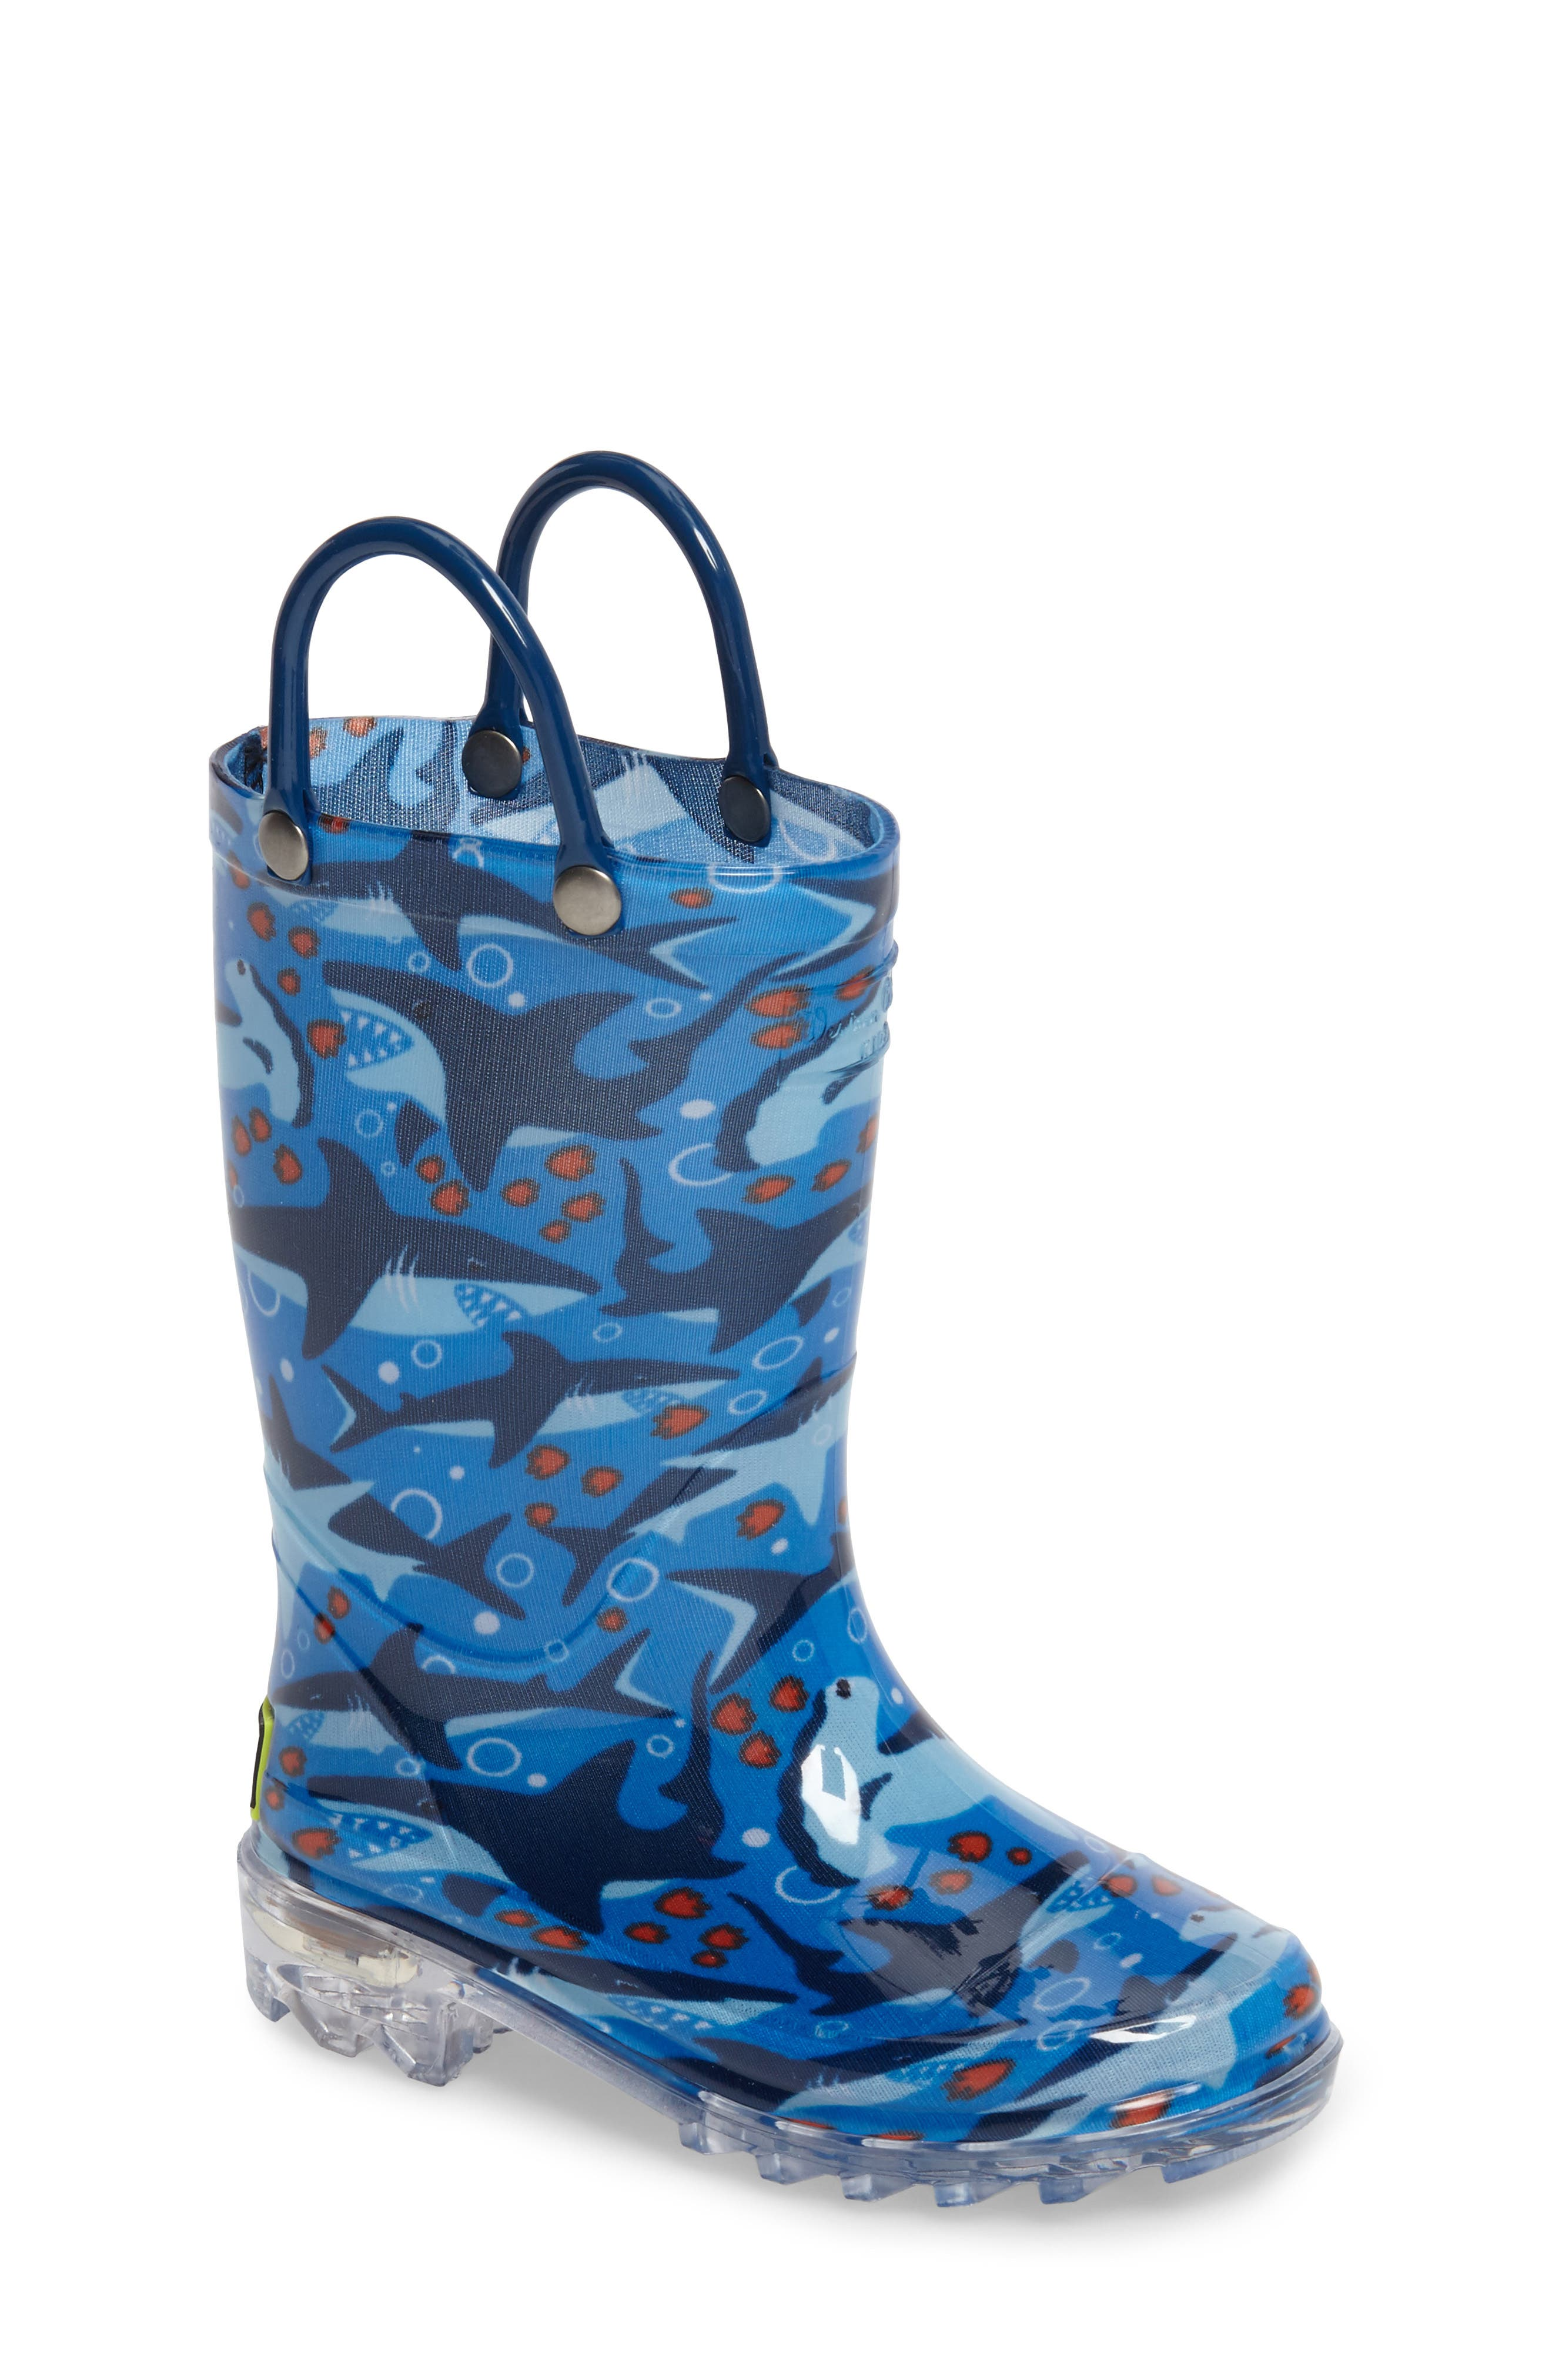 Shark Chase Light-Up Rain Boot,                             Main thumbnail 1, color,                             420